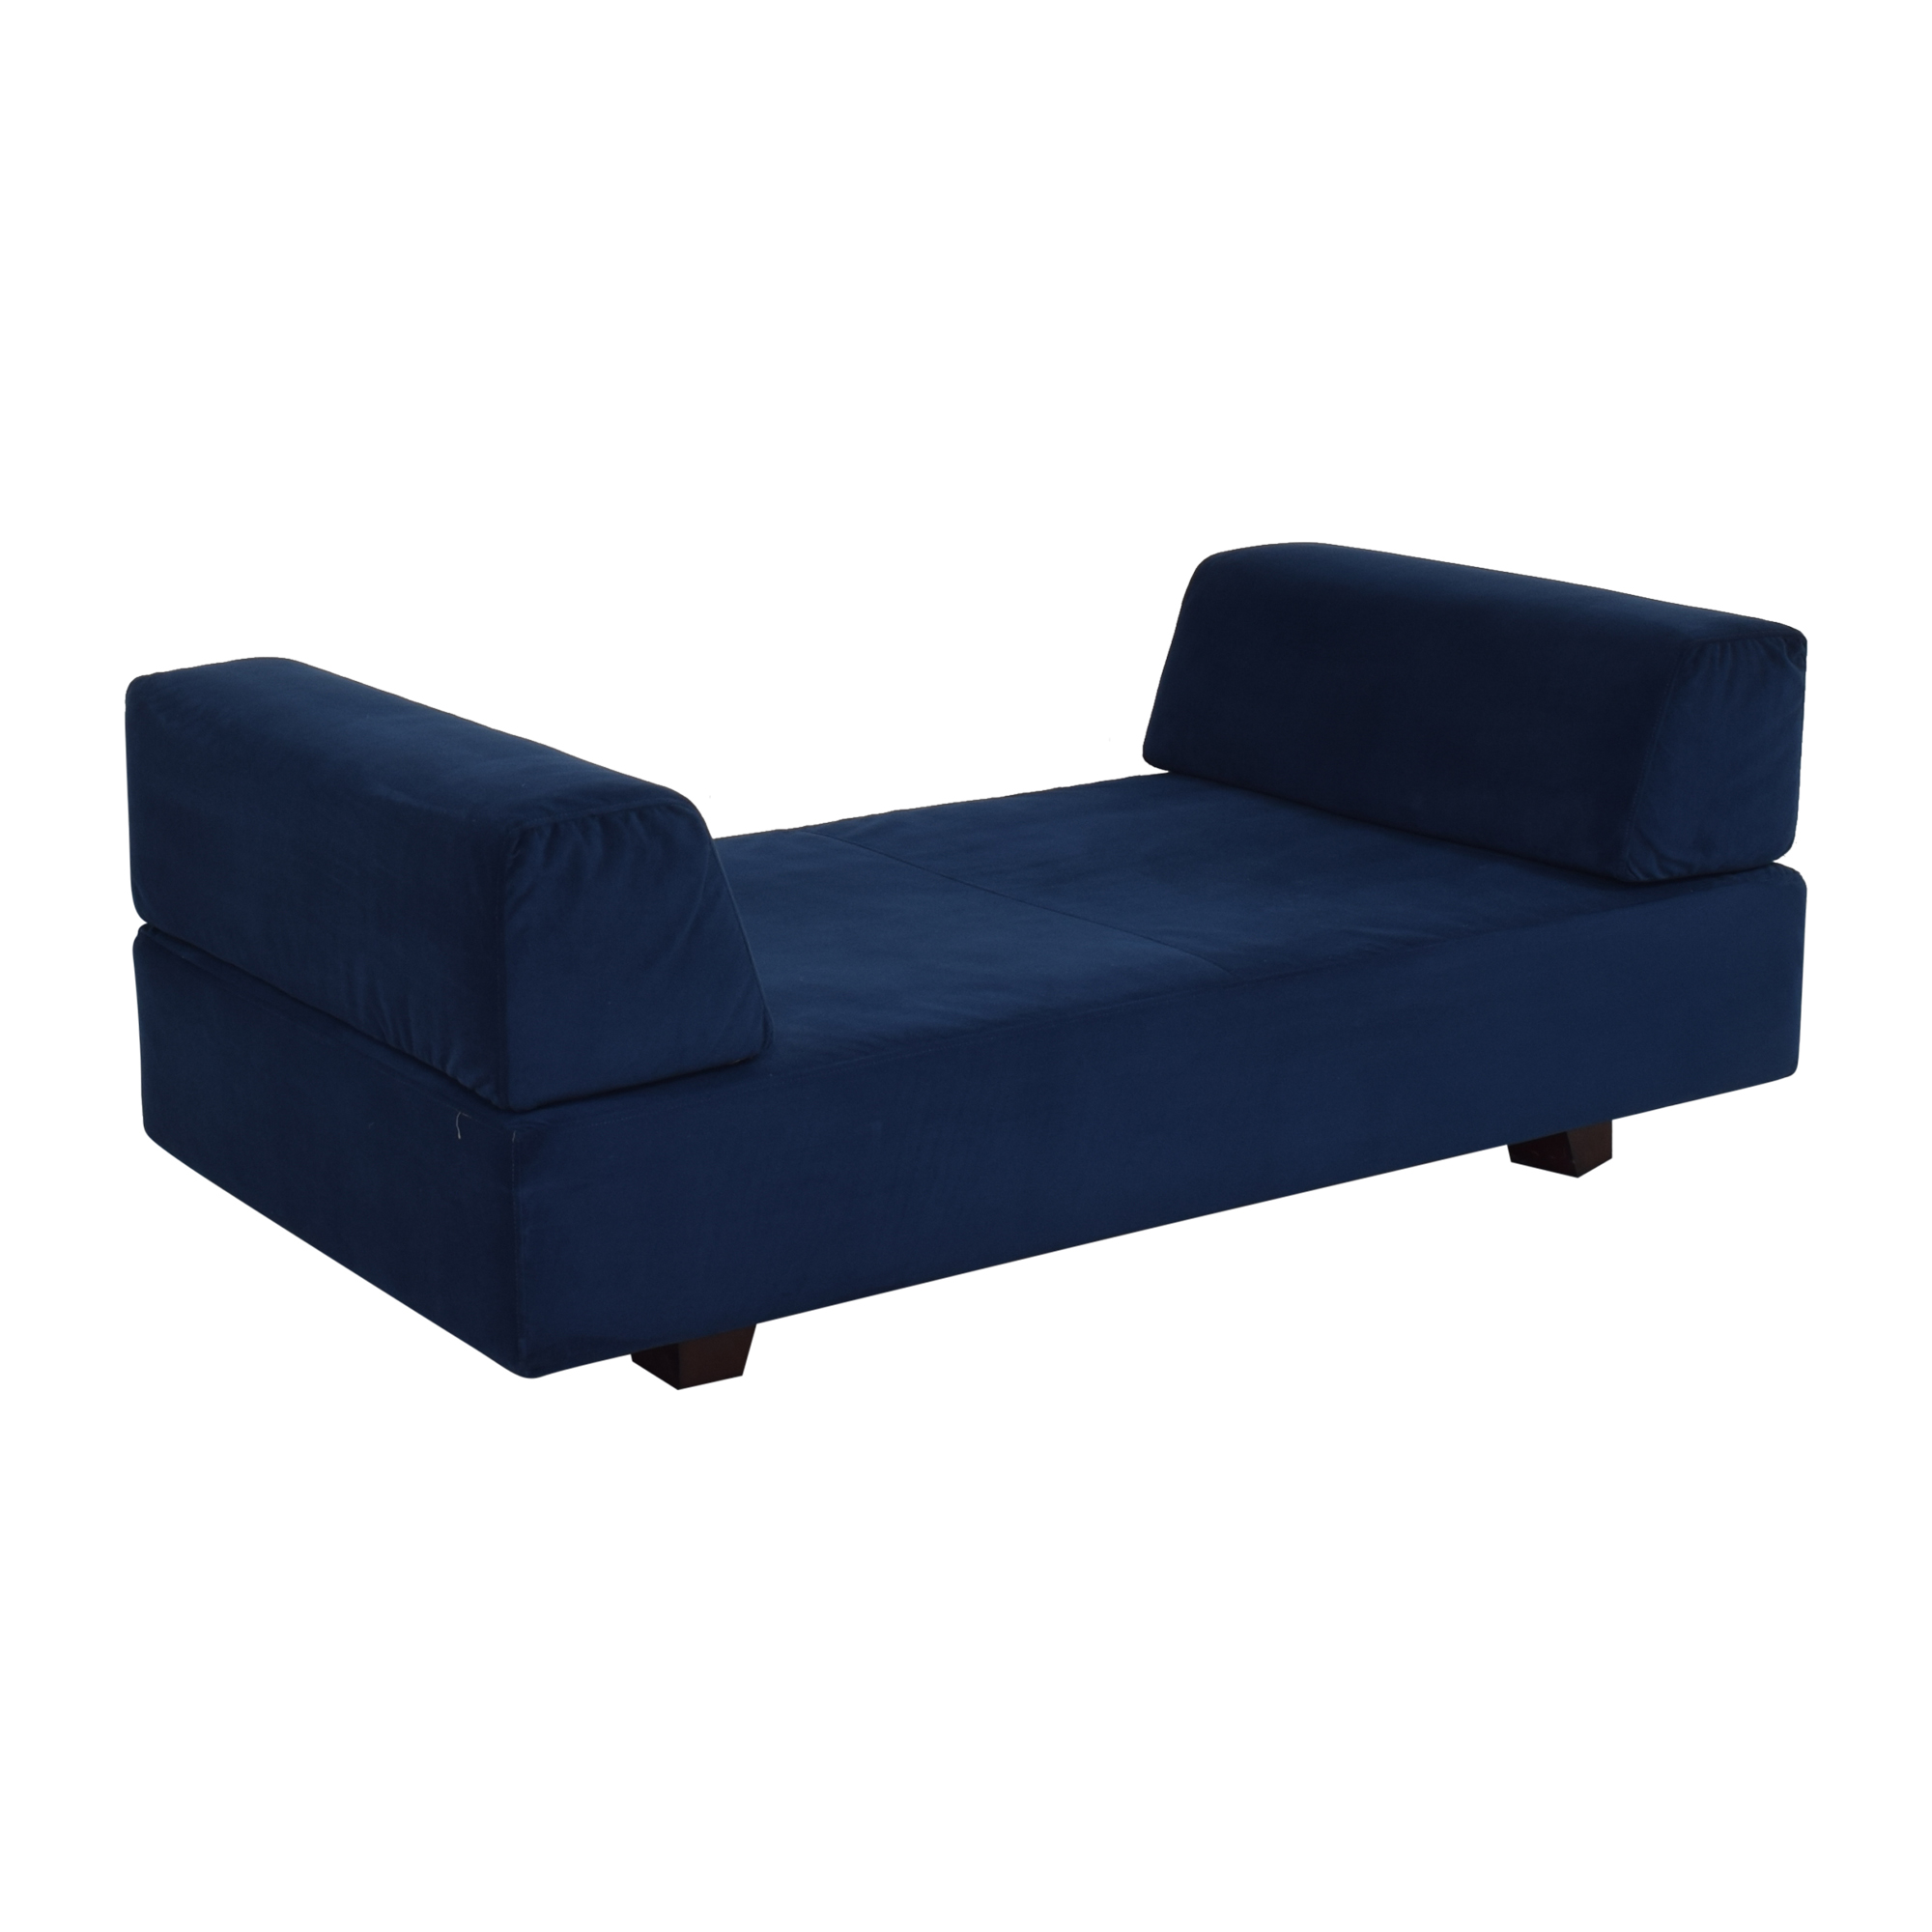 West Elm West Elm Tillary Sofa blue